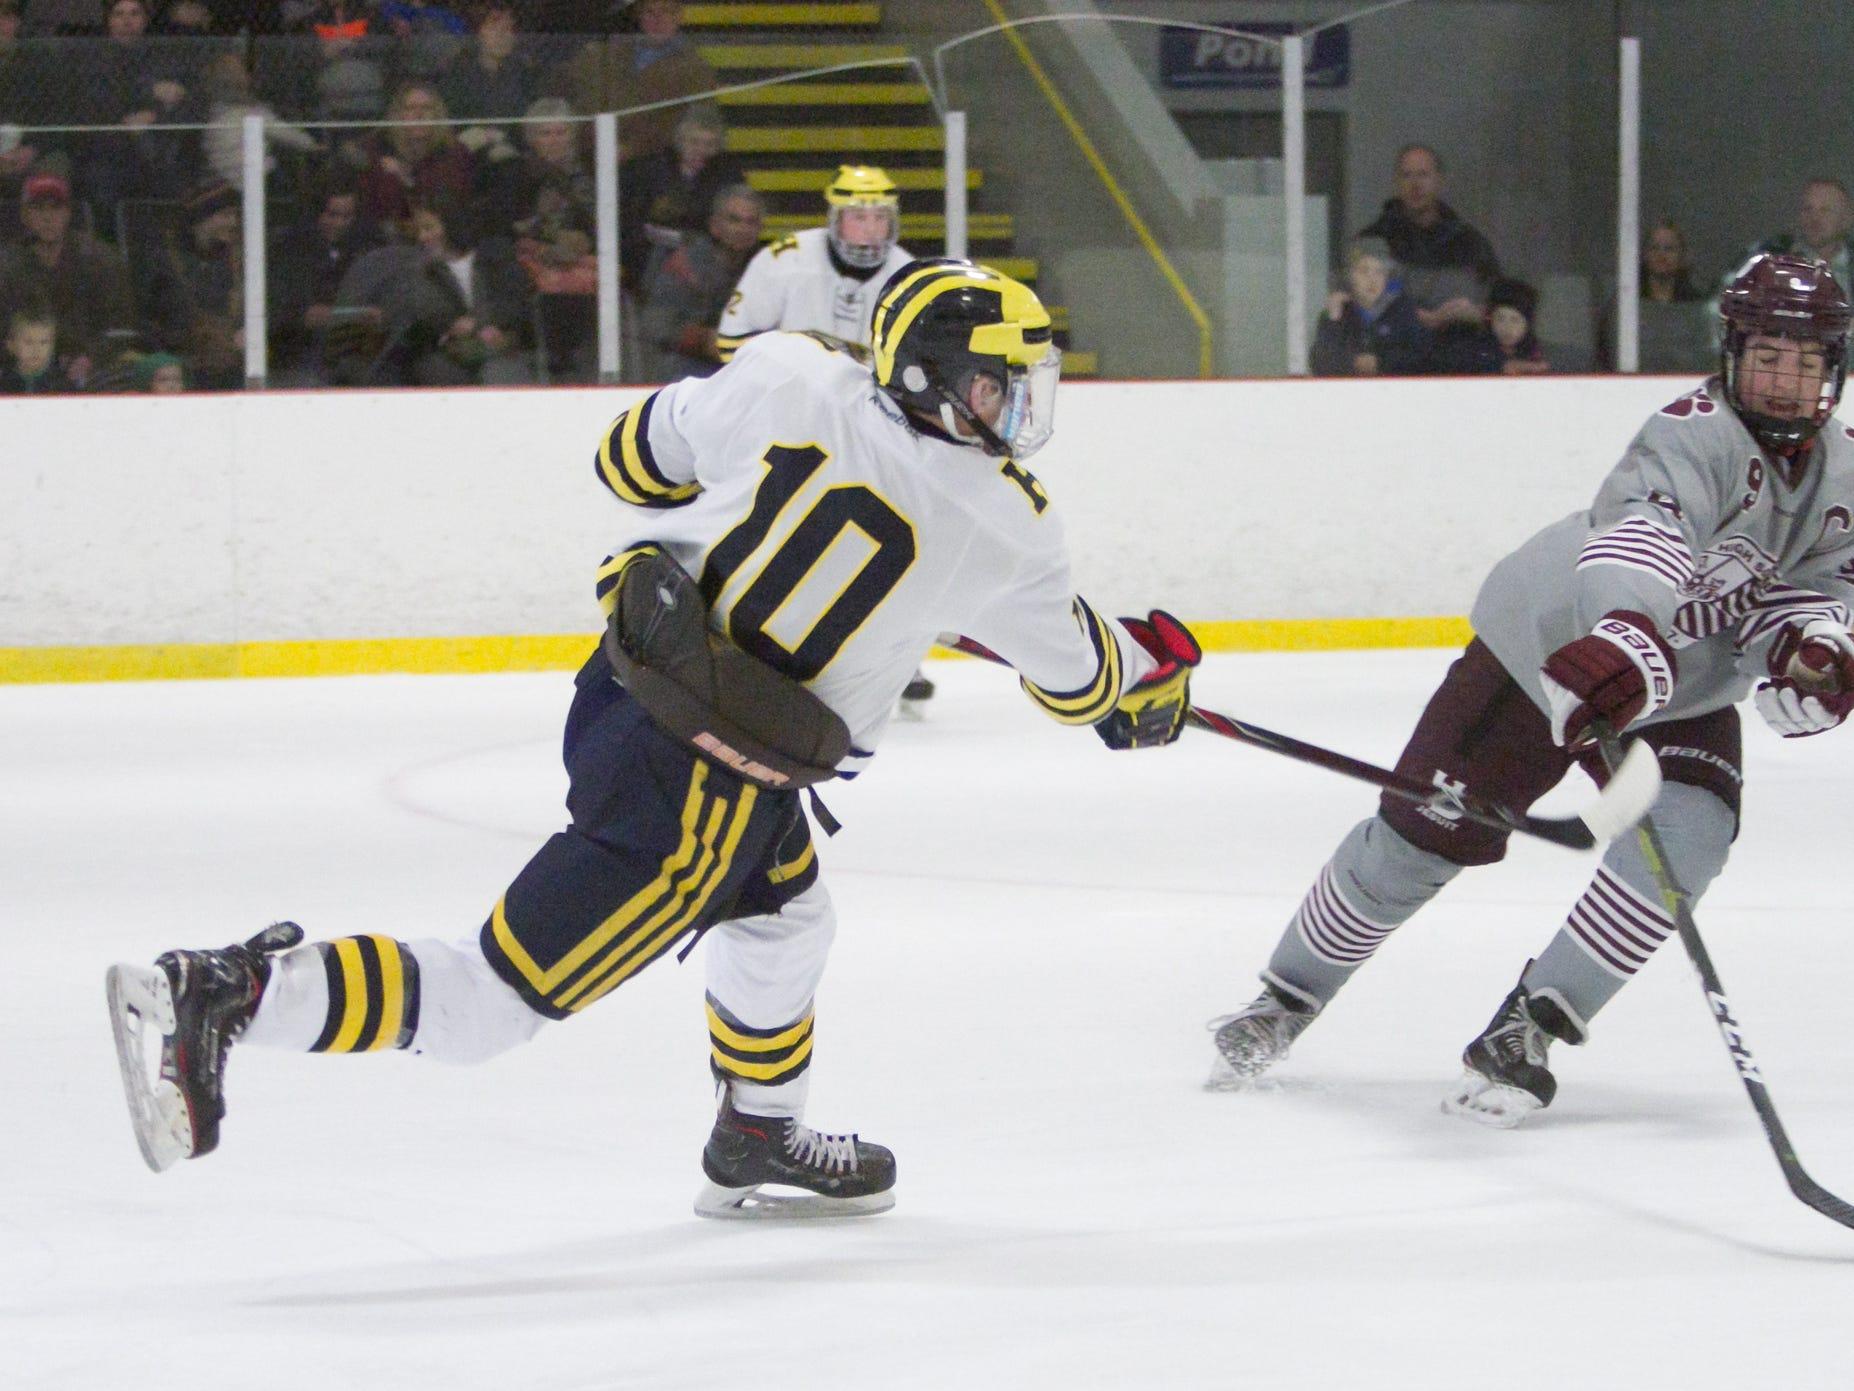 Hartland's Adam Pietila shoots the puck past Detroit U of D Jesuit's Ben Charboneau on Friday, Jan. 11, 2019 at Hartland Sports Center.